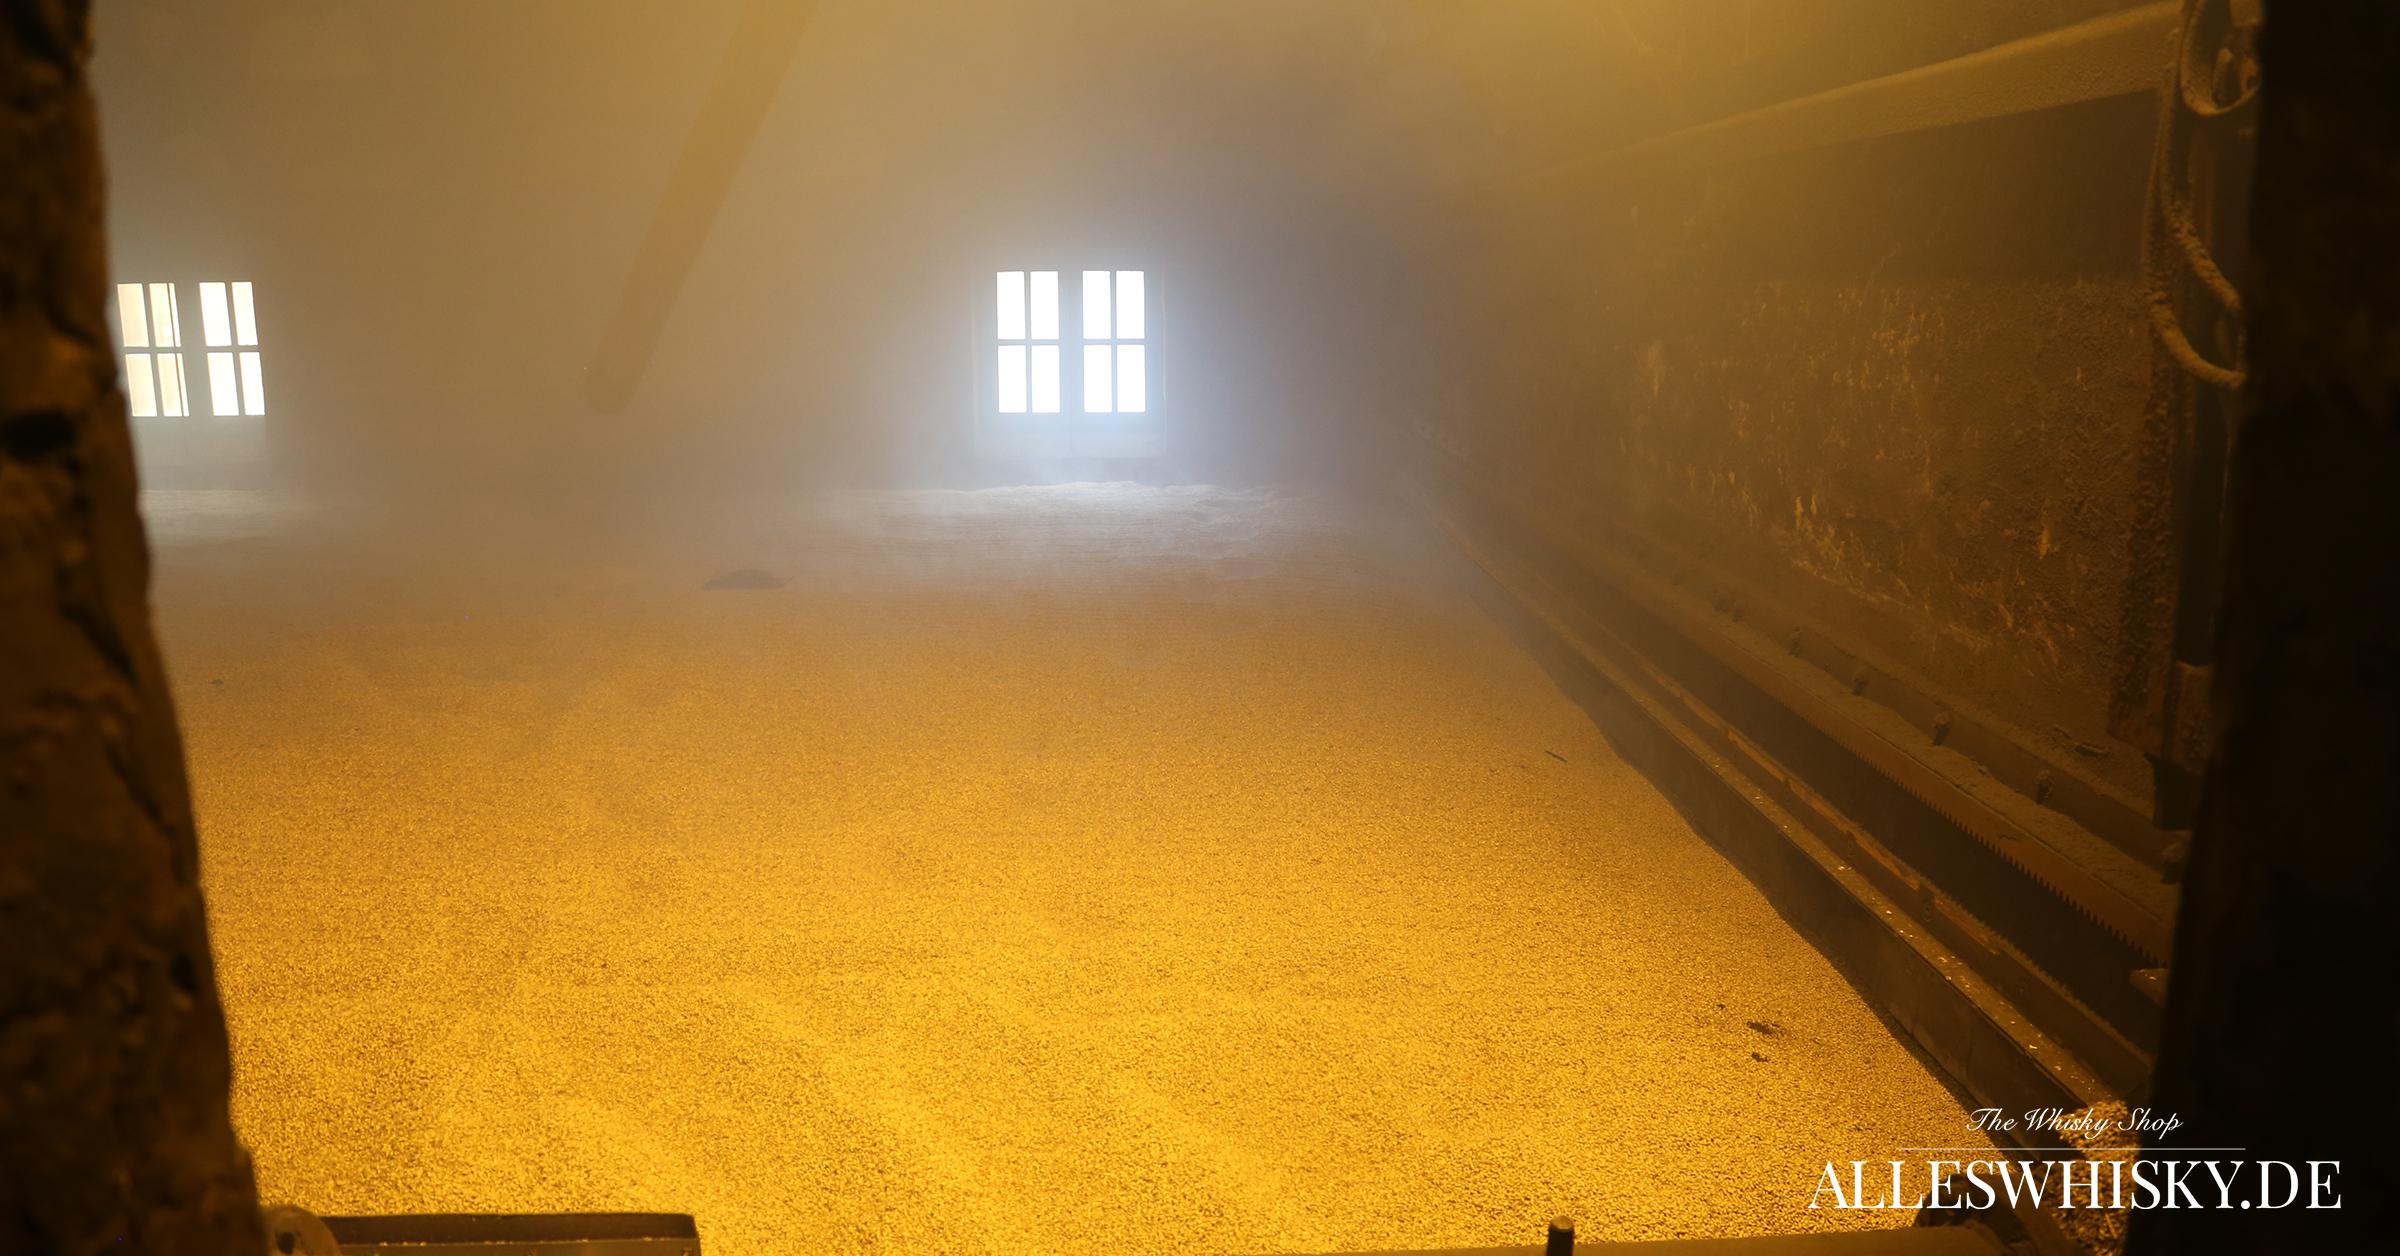 Highland Park - Blick in den Kiln Floor mit der trocknenden Gerste